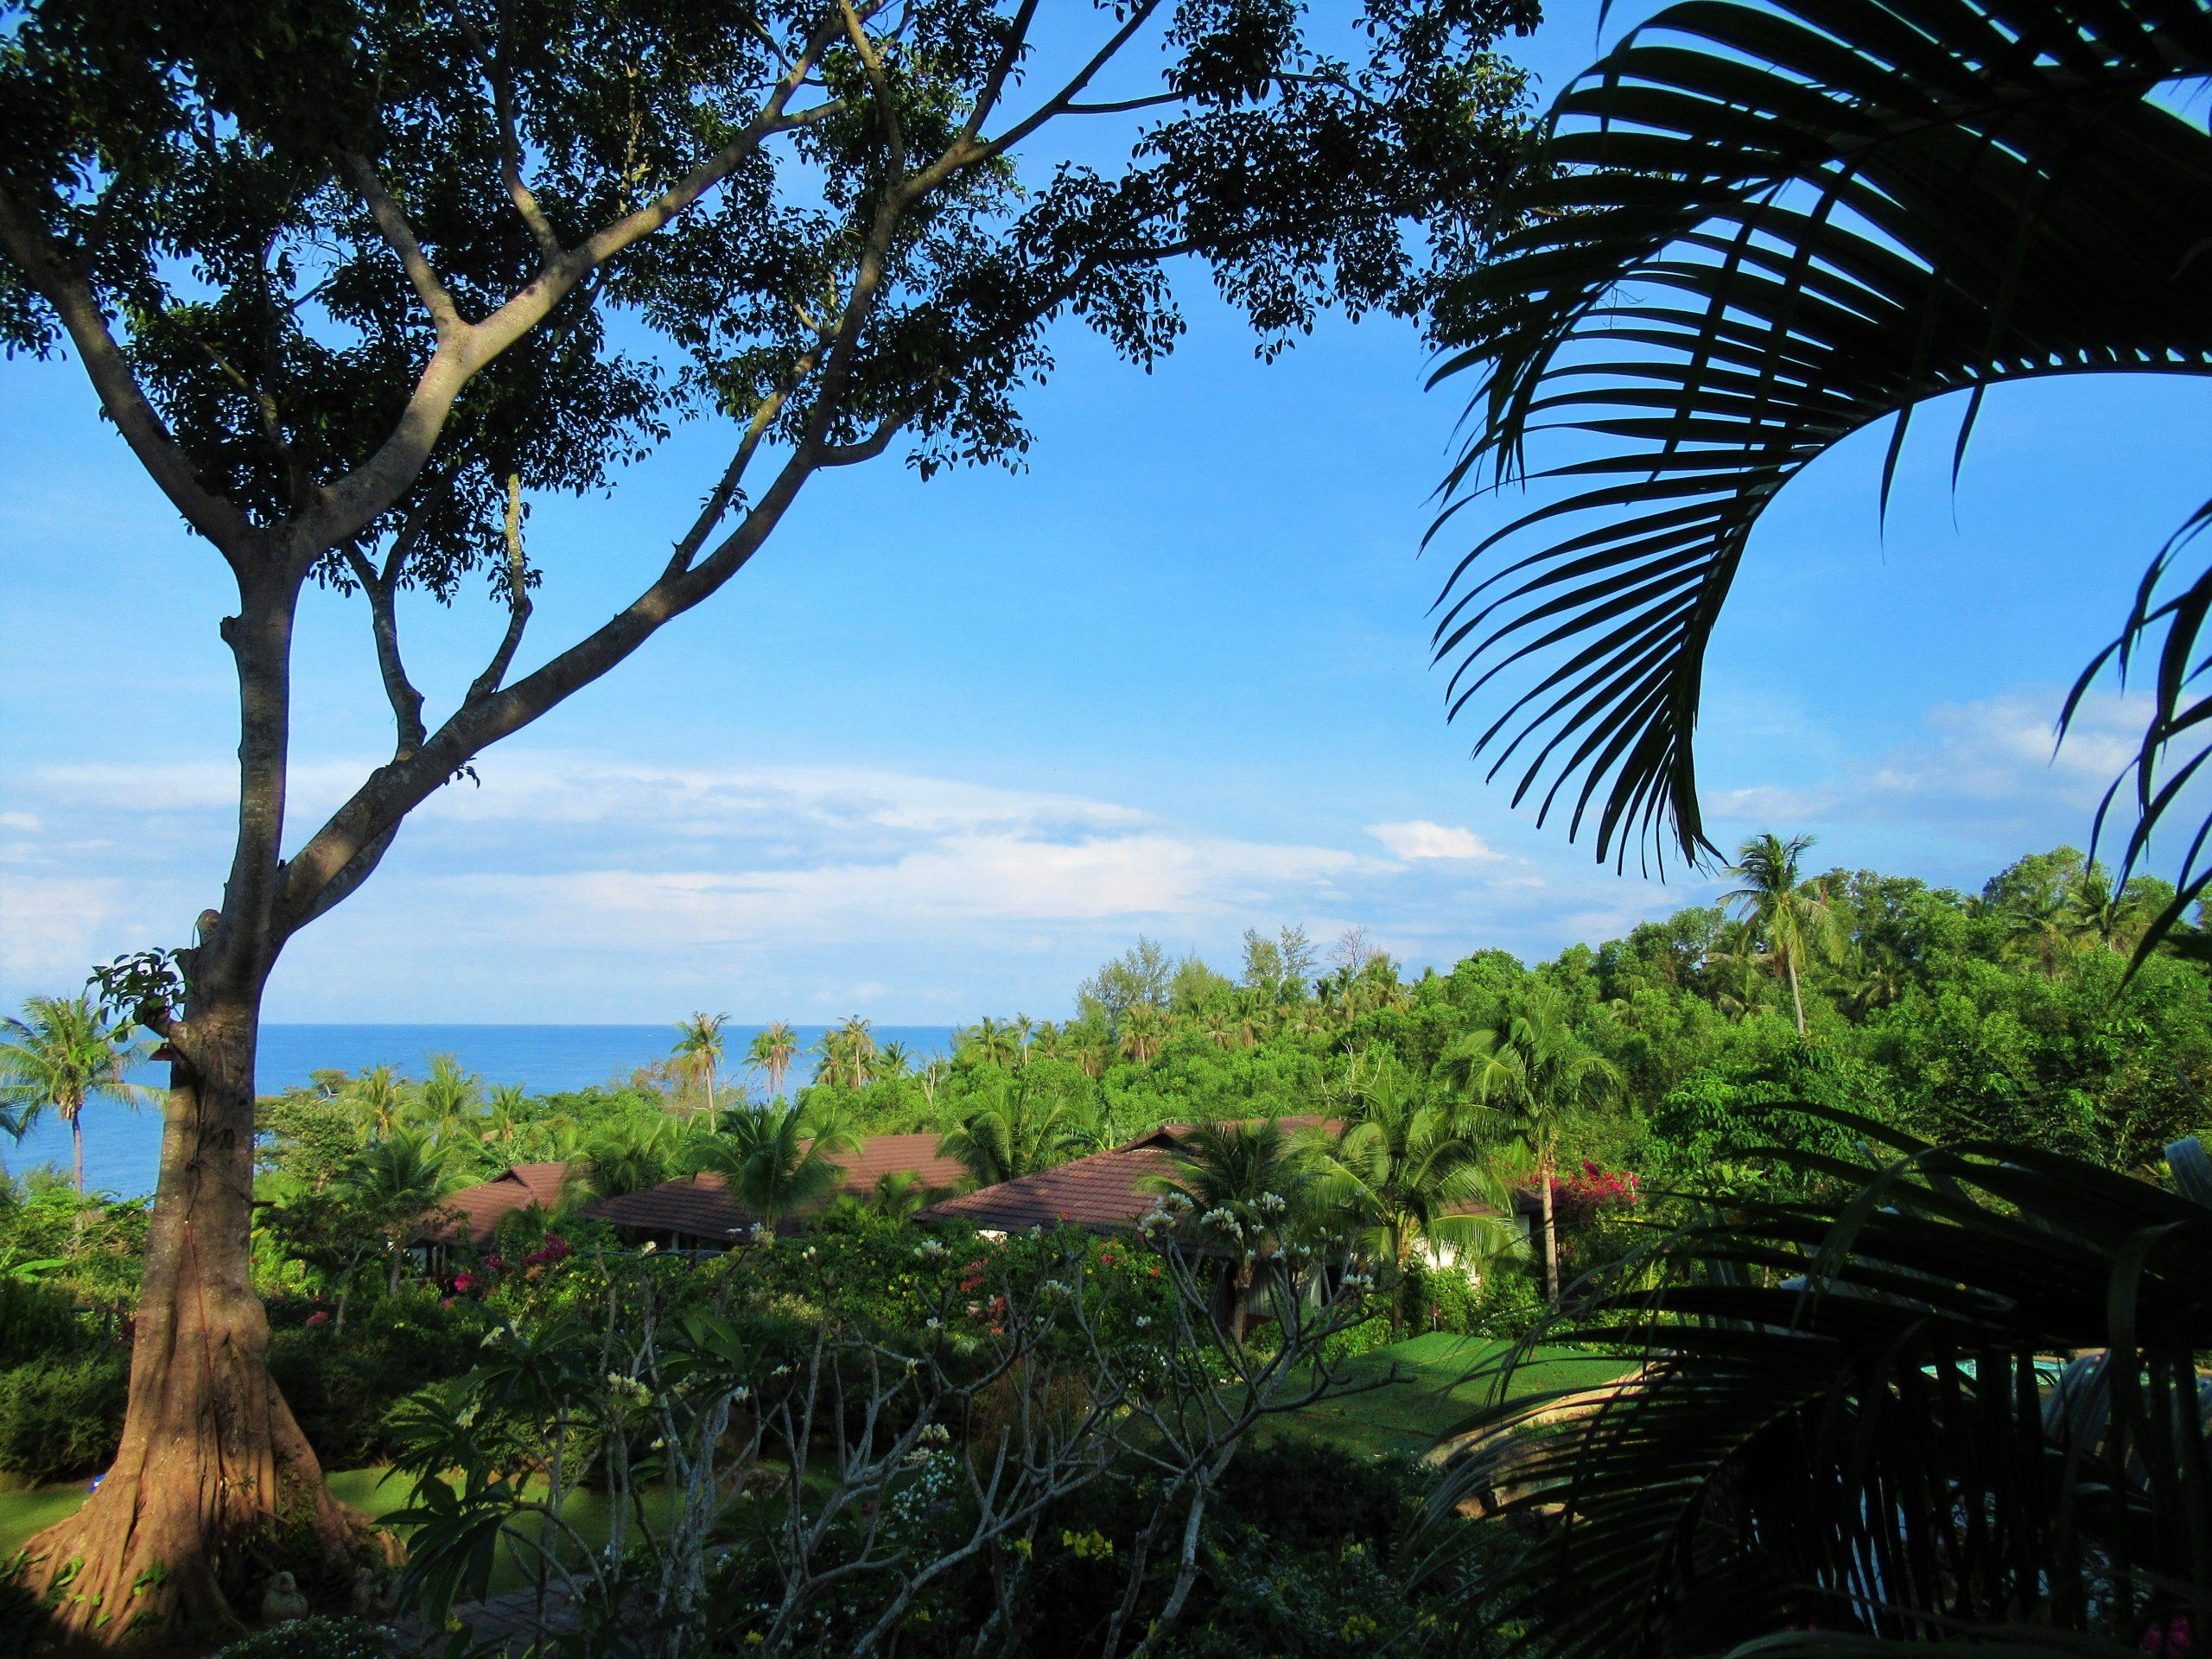 Camia Resort, Phu Quoc Island, Vietnam